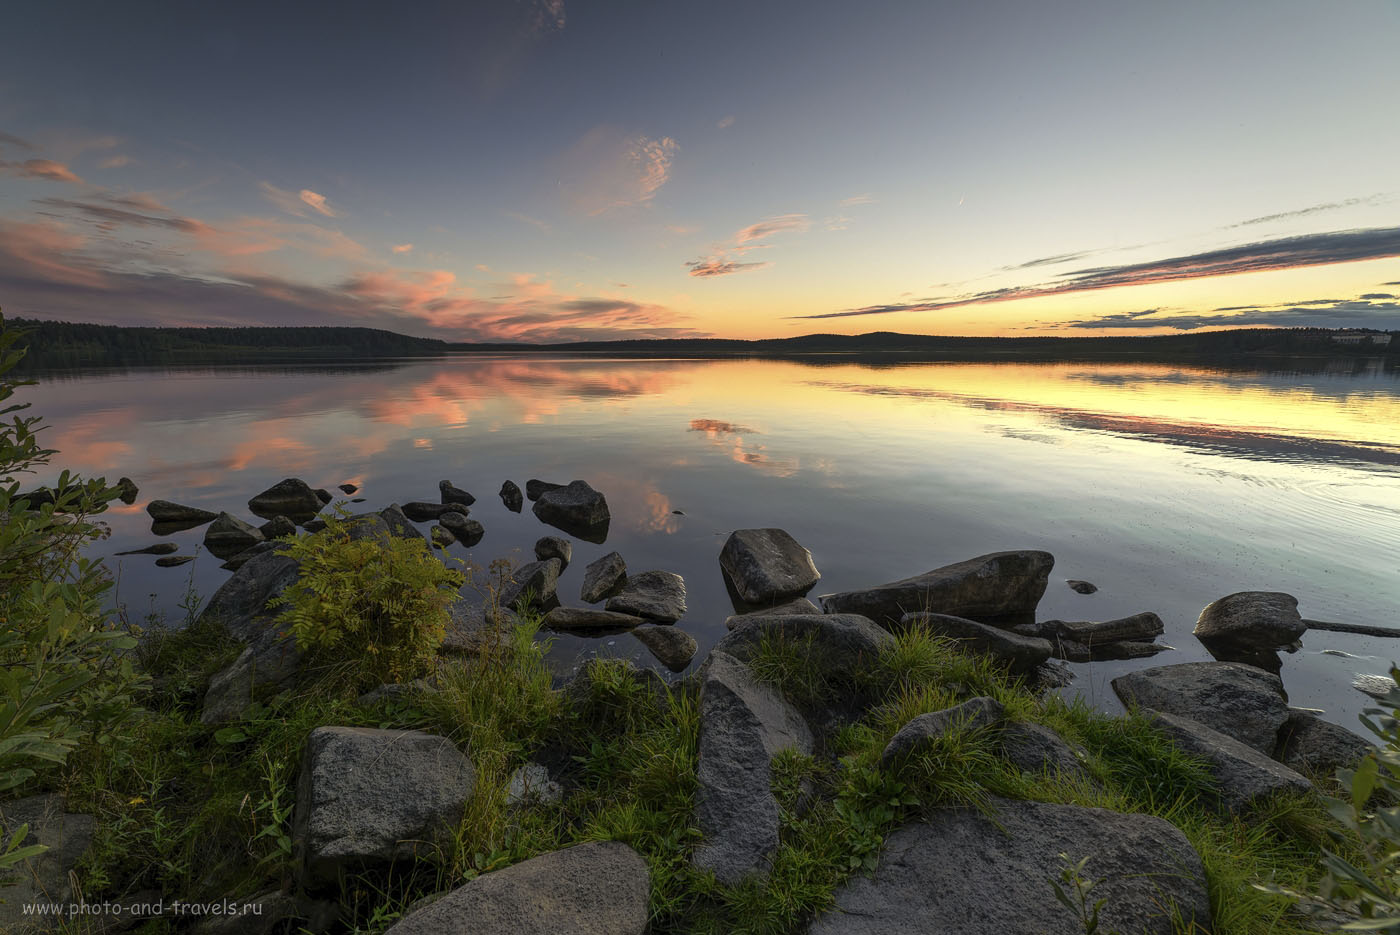 20. Пример пейзажа, снятого после захода солнца. Фотоаппарат Nikon D610, ширик Samyang 14/2.8